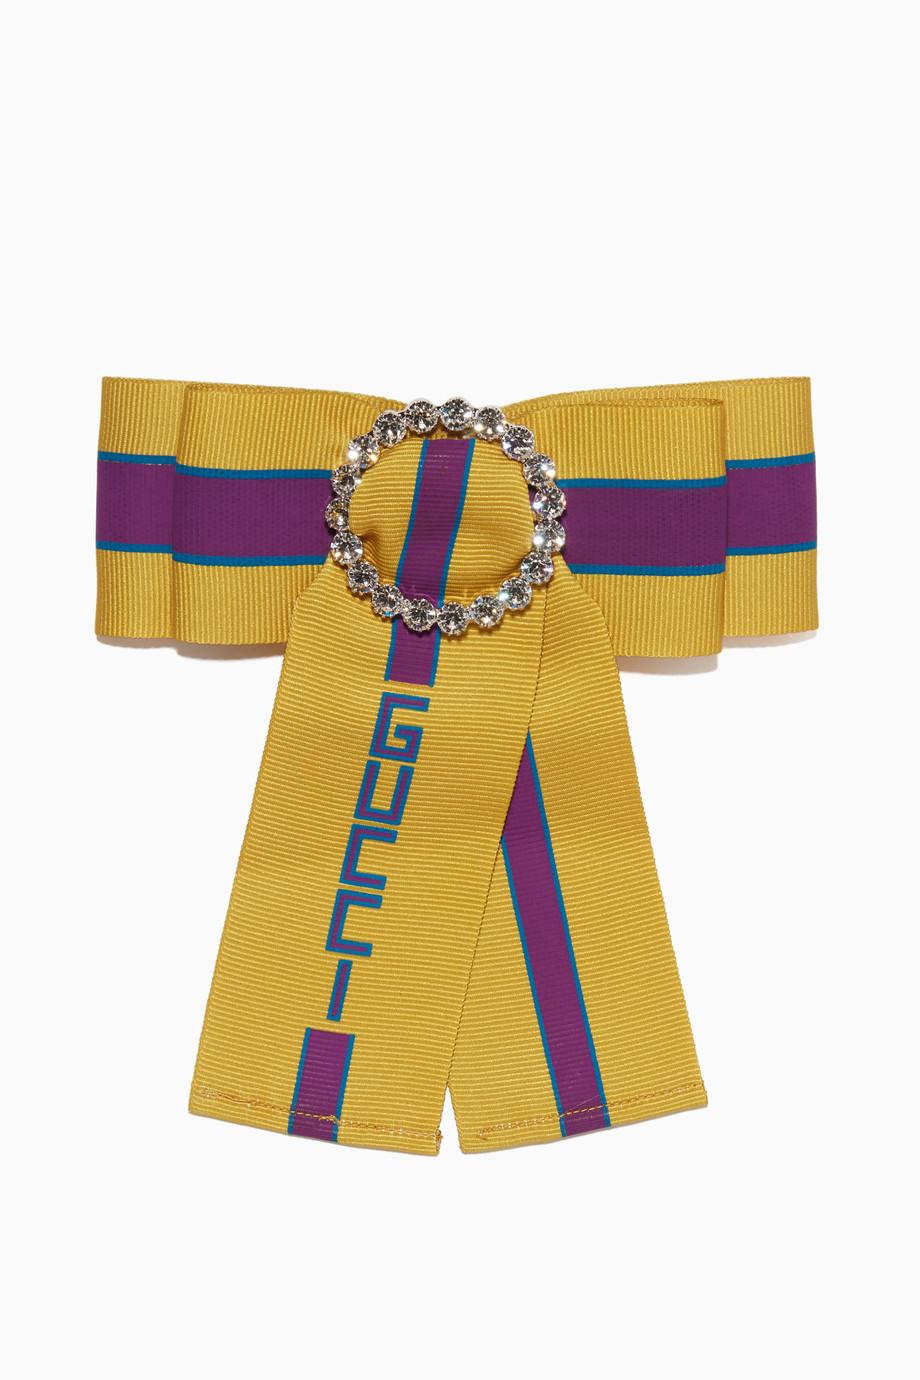 7dac97eb2c8 Shop Gucci Multicolour Multi-Colour Crystal Bow Brooch for Women ...